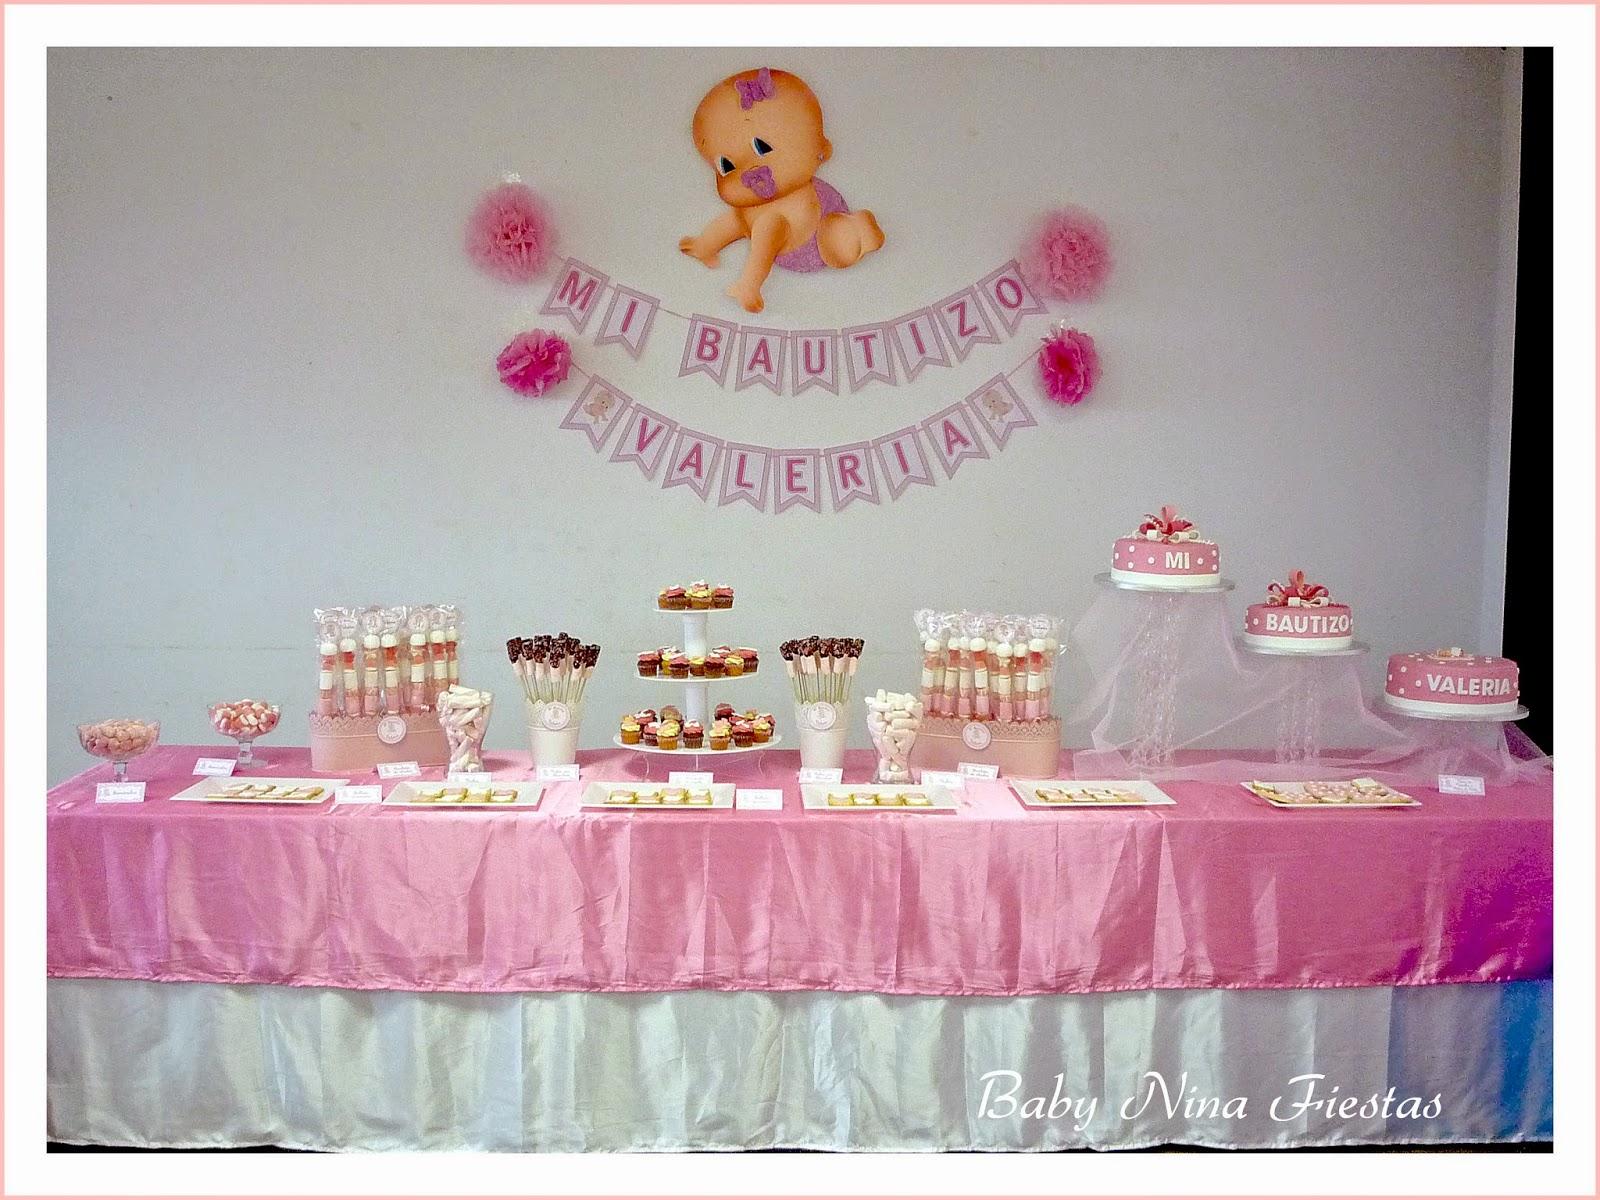 Baby nina fiestas bautizo de valeria for Mesa de dulces para bautizo de nina